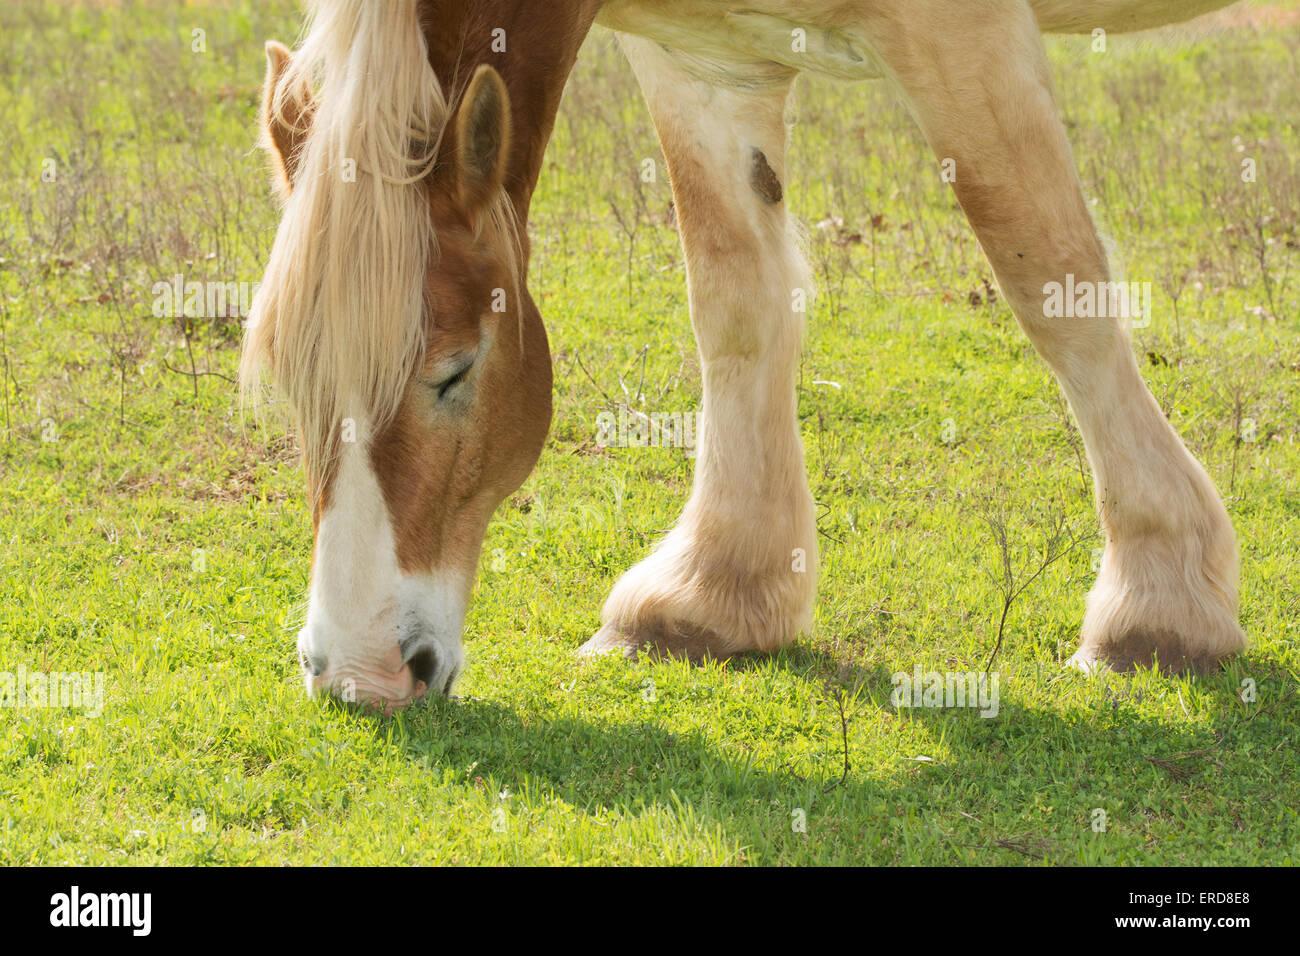 Blond Belgian draft horse grazing in spring sun - Stock Image